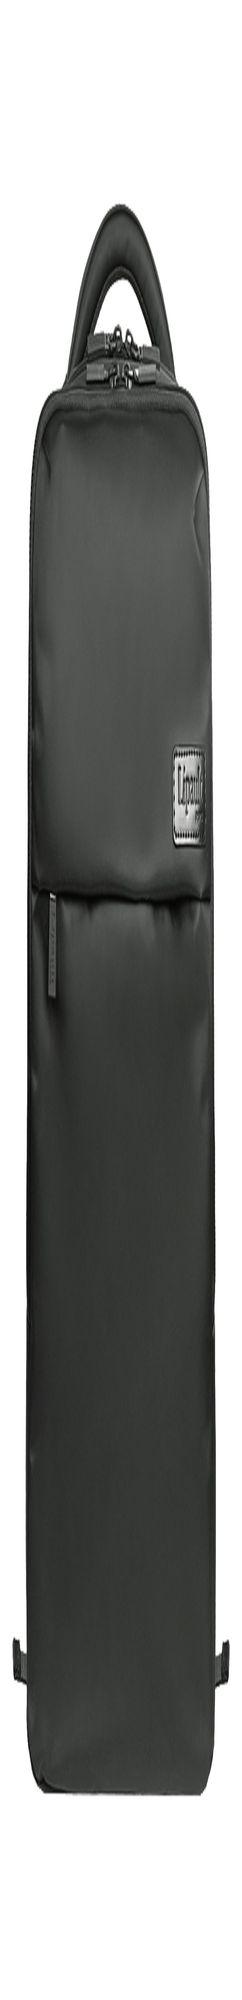 Рюкзак для ноутбука Plume Business, серый фото